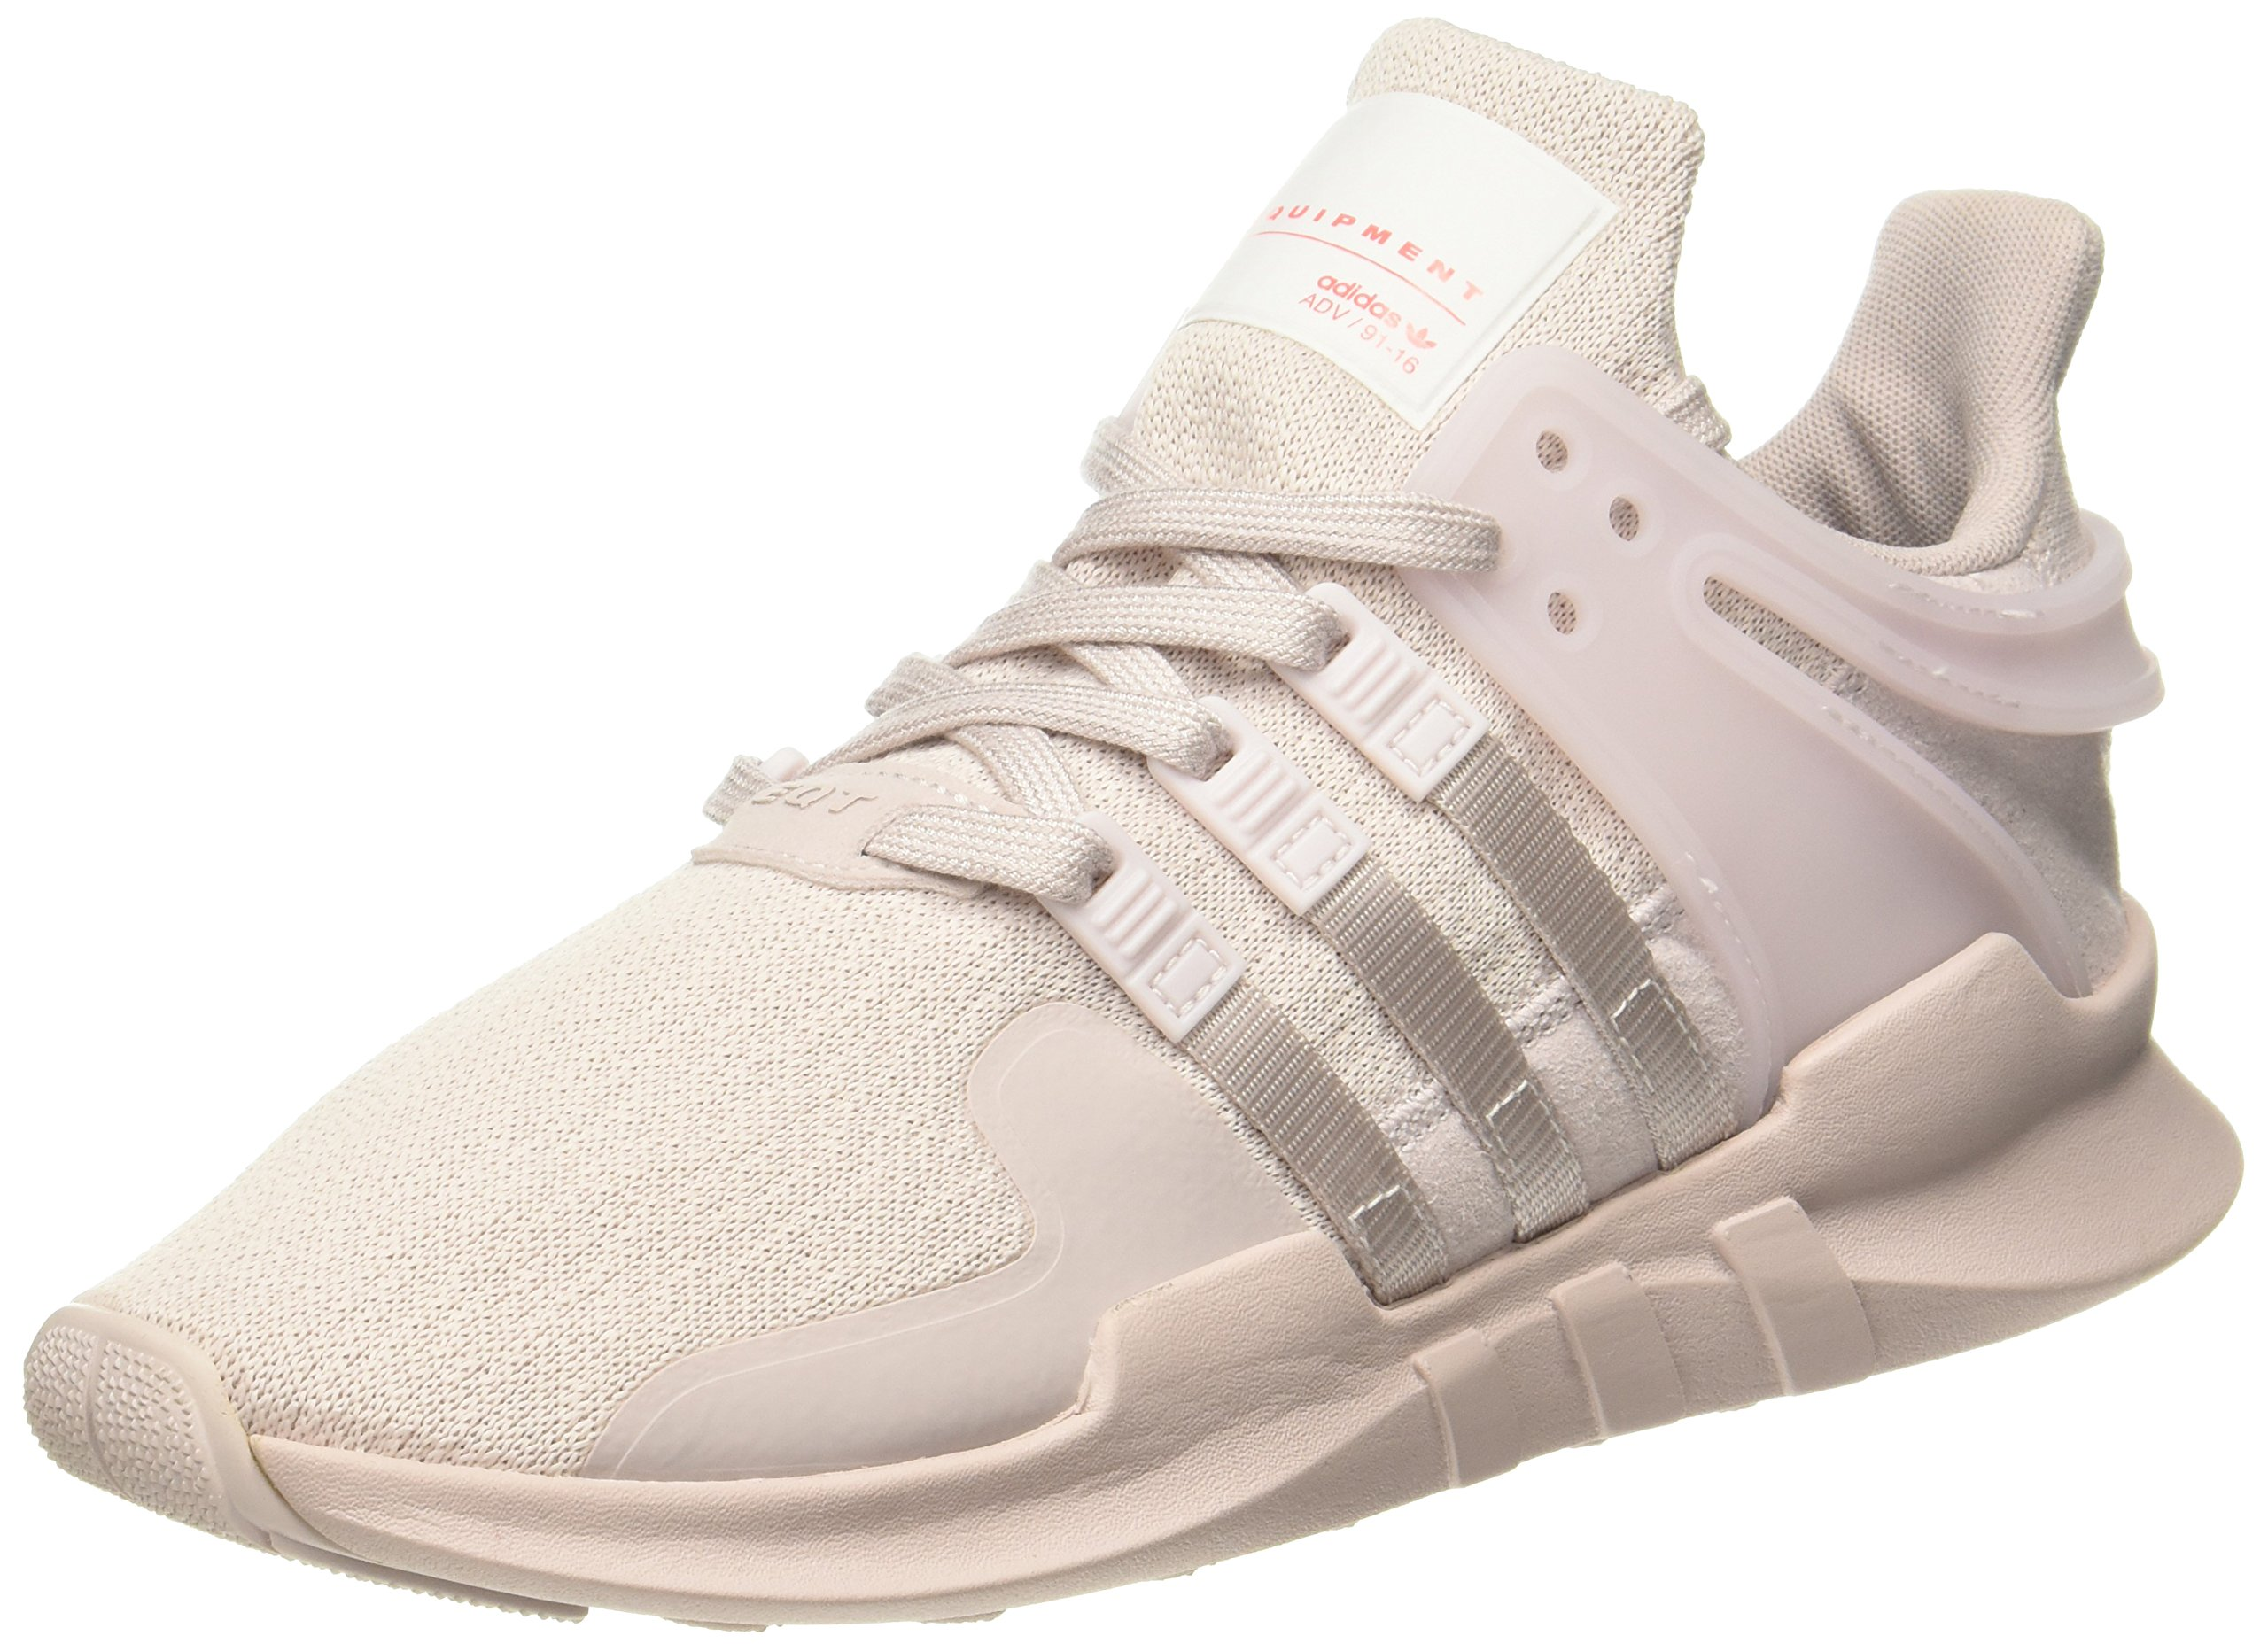 adidas Originals Women's EQT Support Adv Trainers Ice